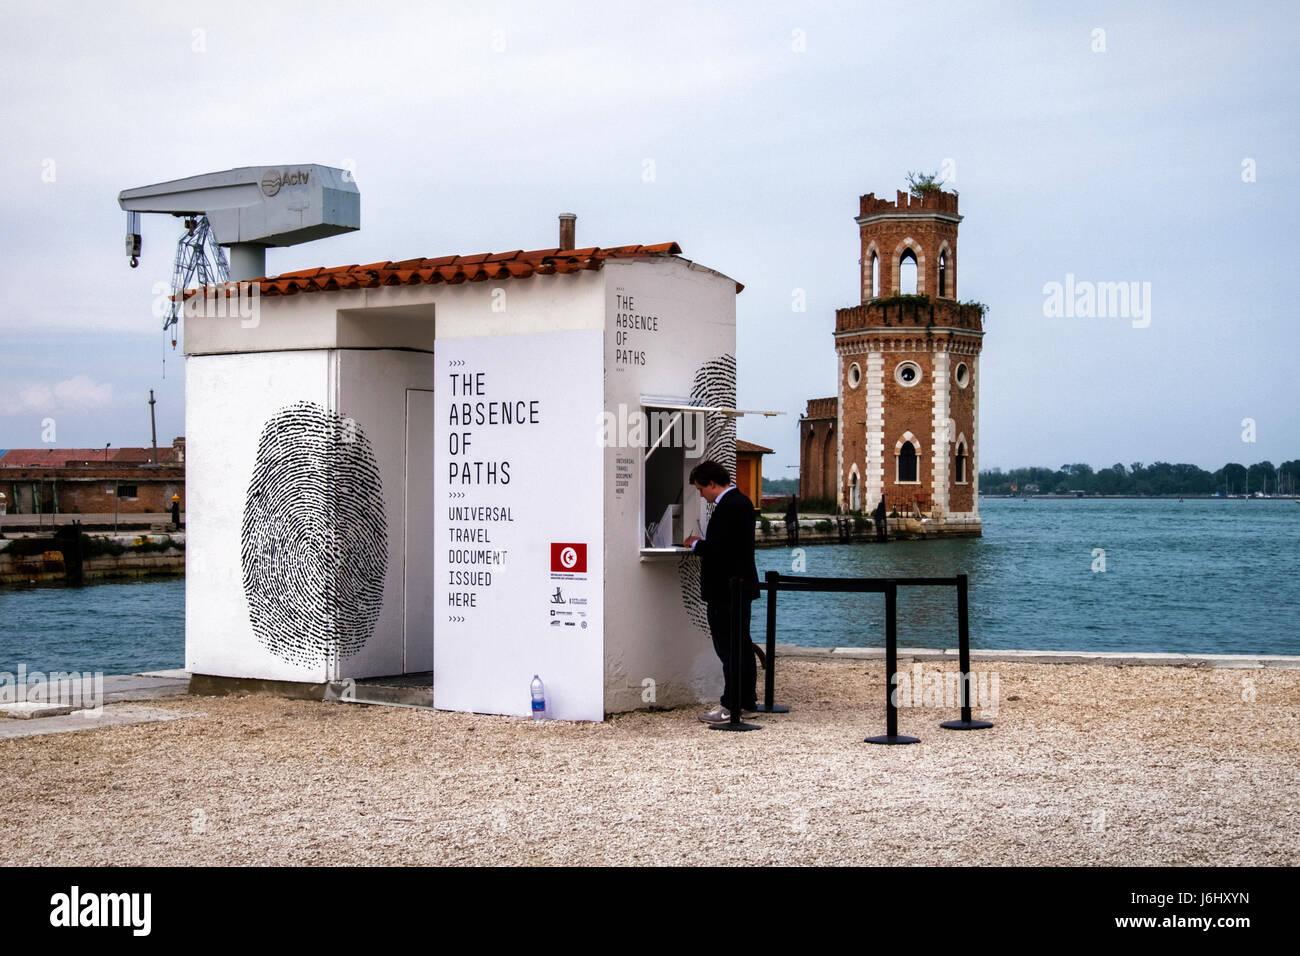 Hafen von Venedig, Castello, Arsenale. 57. Biennale 2017, La Biennale di Venezia.Tunisian Pavillon, die Abwesenheit Stockfoto